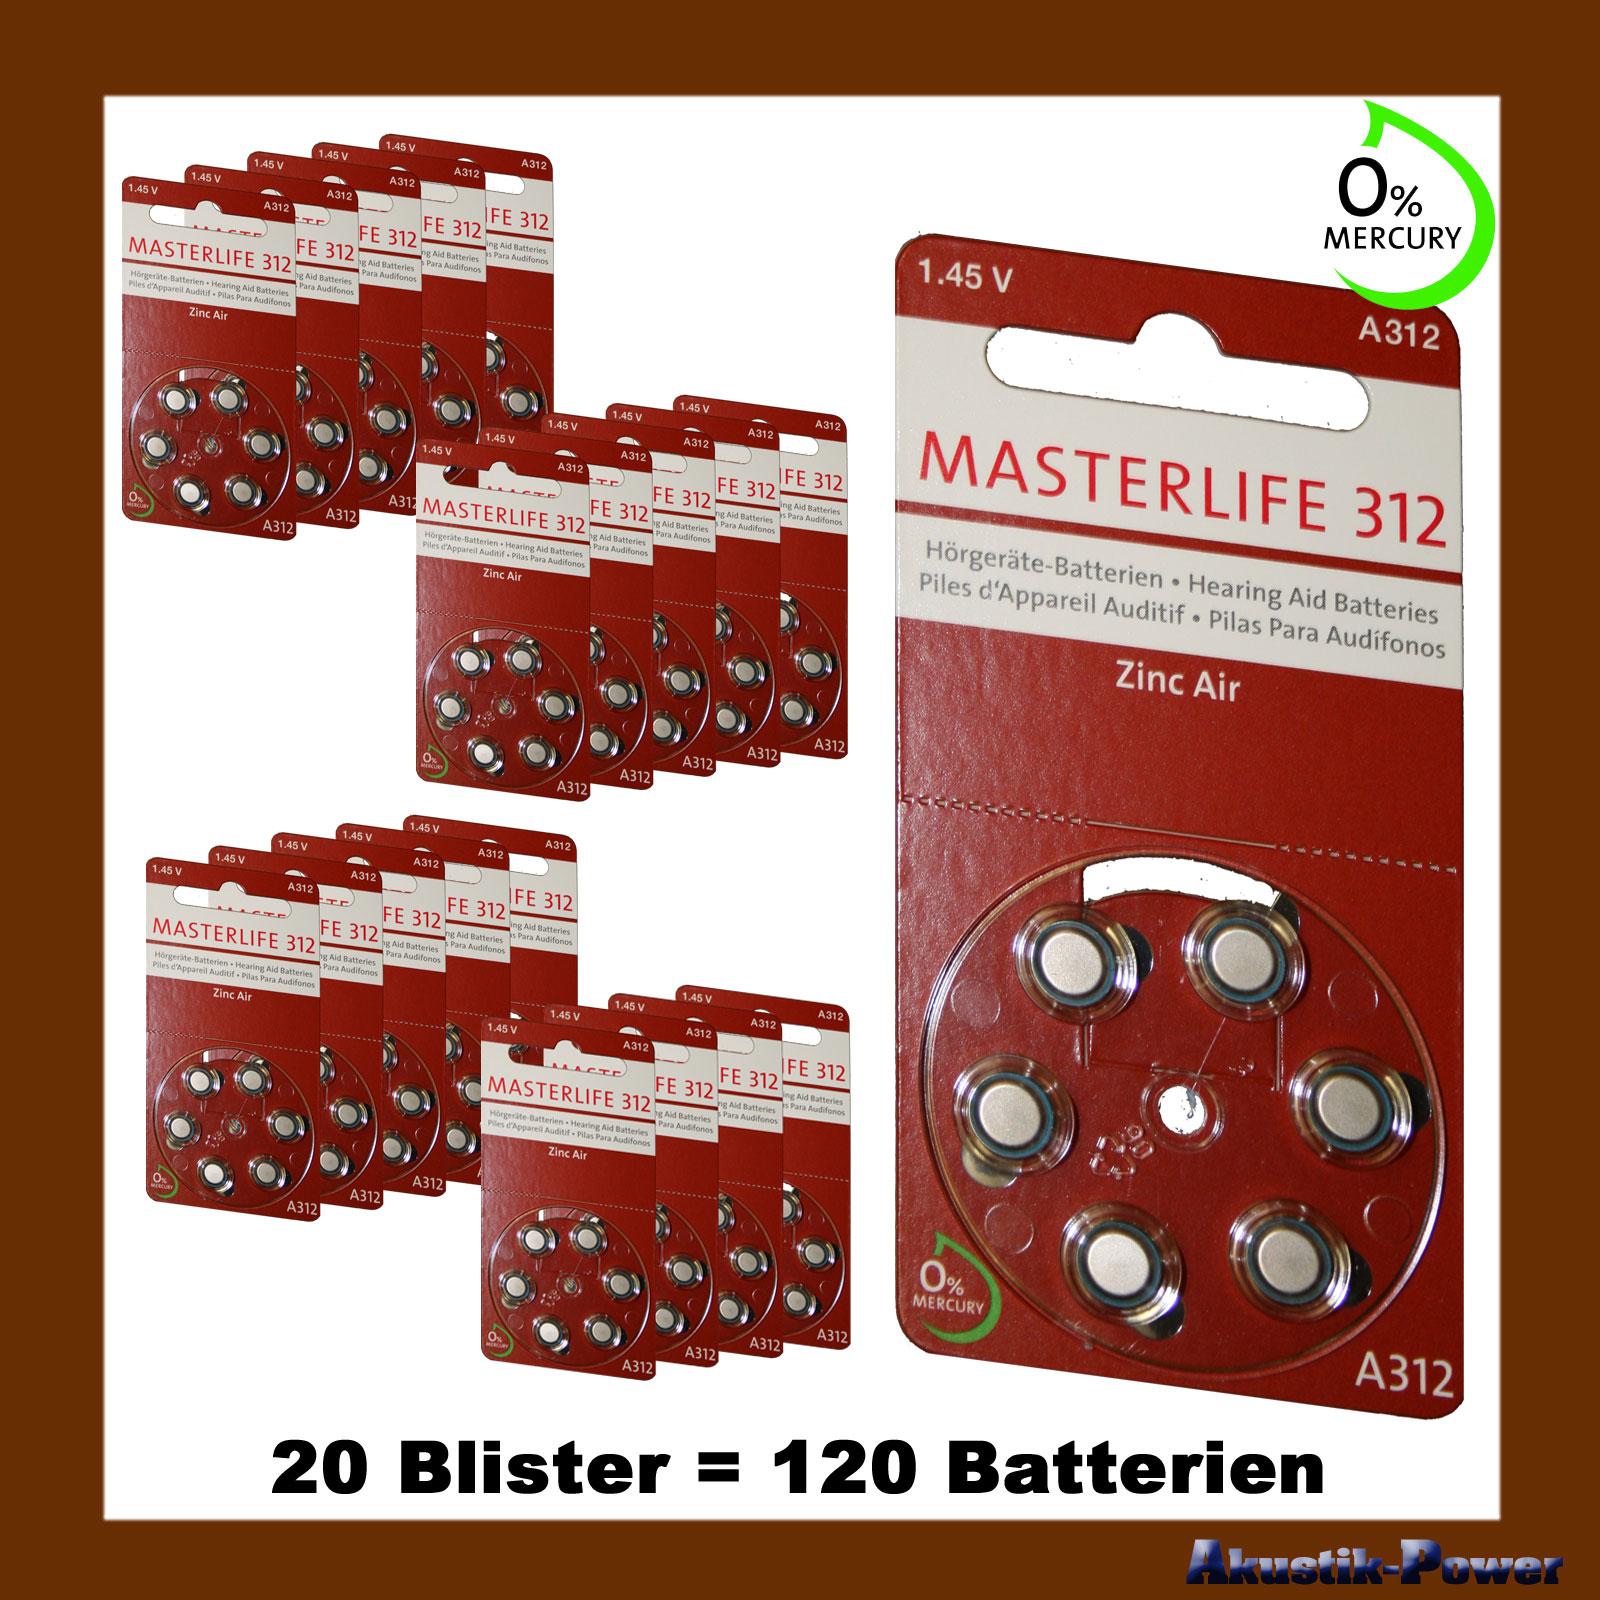 akustik power 120 st ck masterlife h rger te batterie typ 312 pr41 braun a312 mercury free. Black Bedroom Furniture Sets. Home Design Ideas